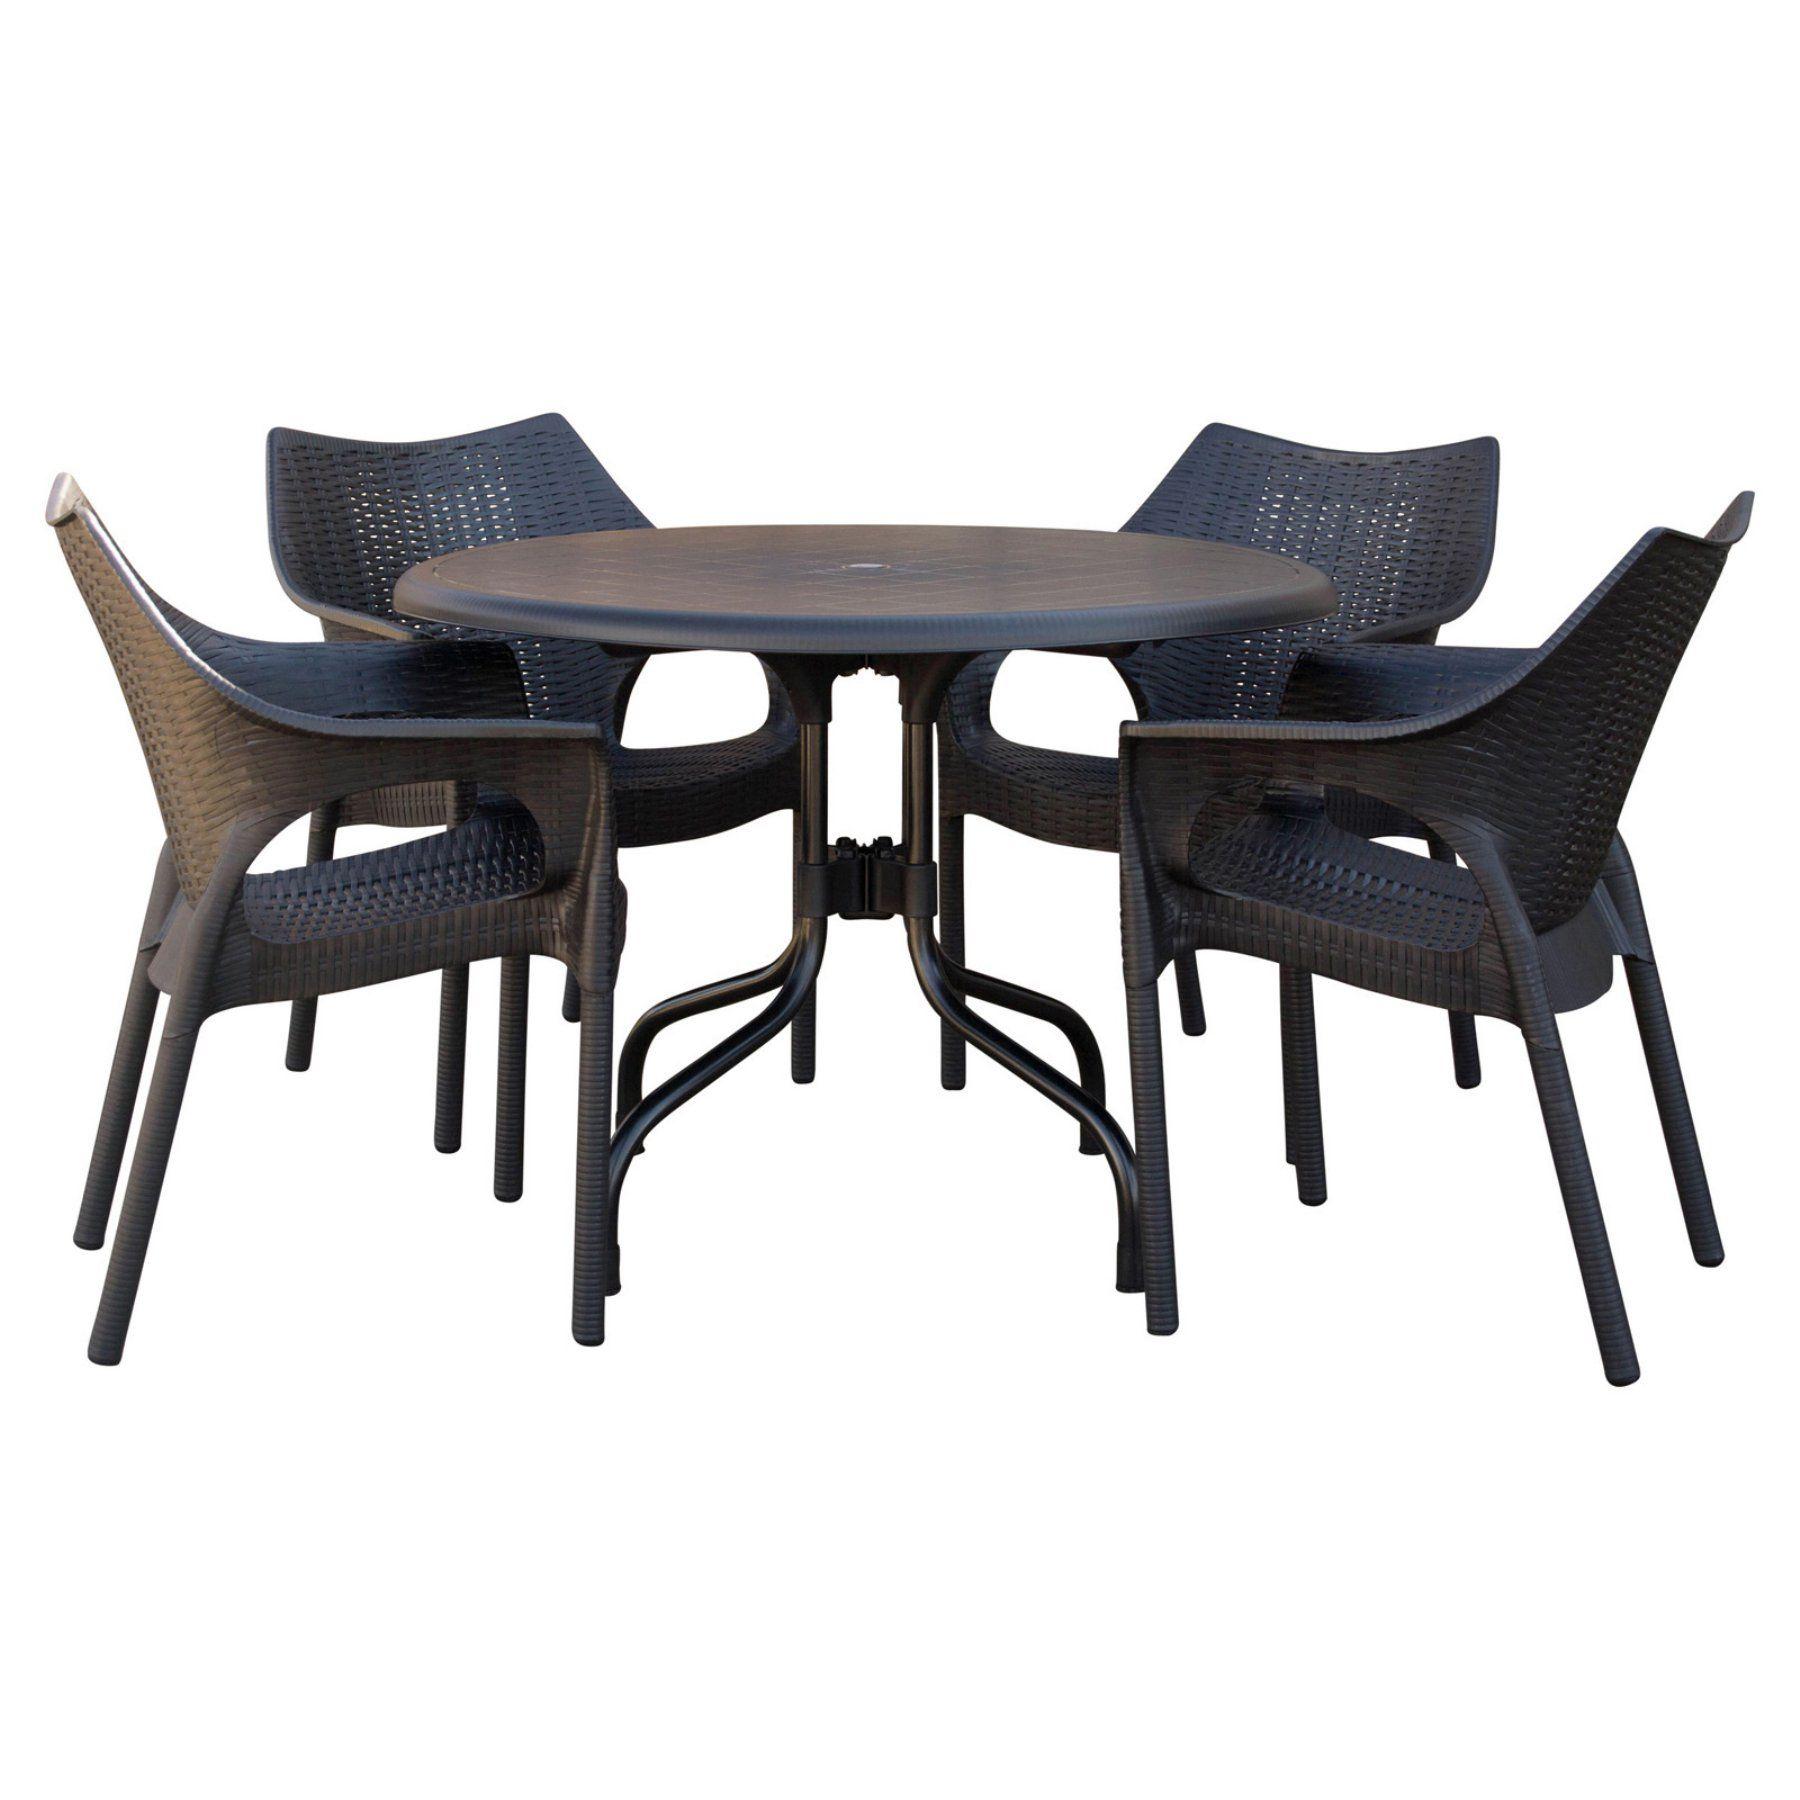 Strata Furniture Delfino Resin Patio Dining Set With Cabridge